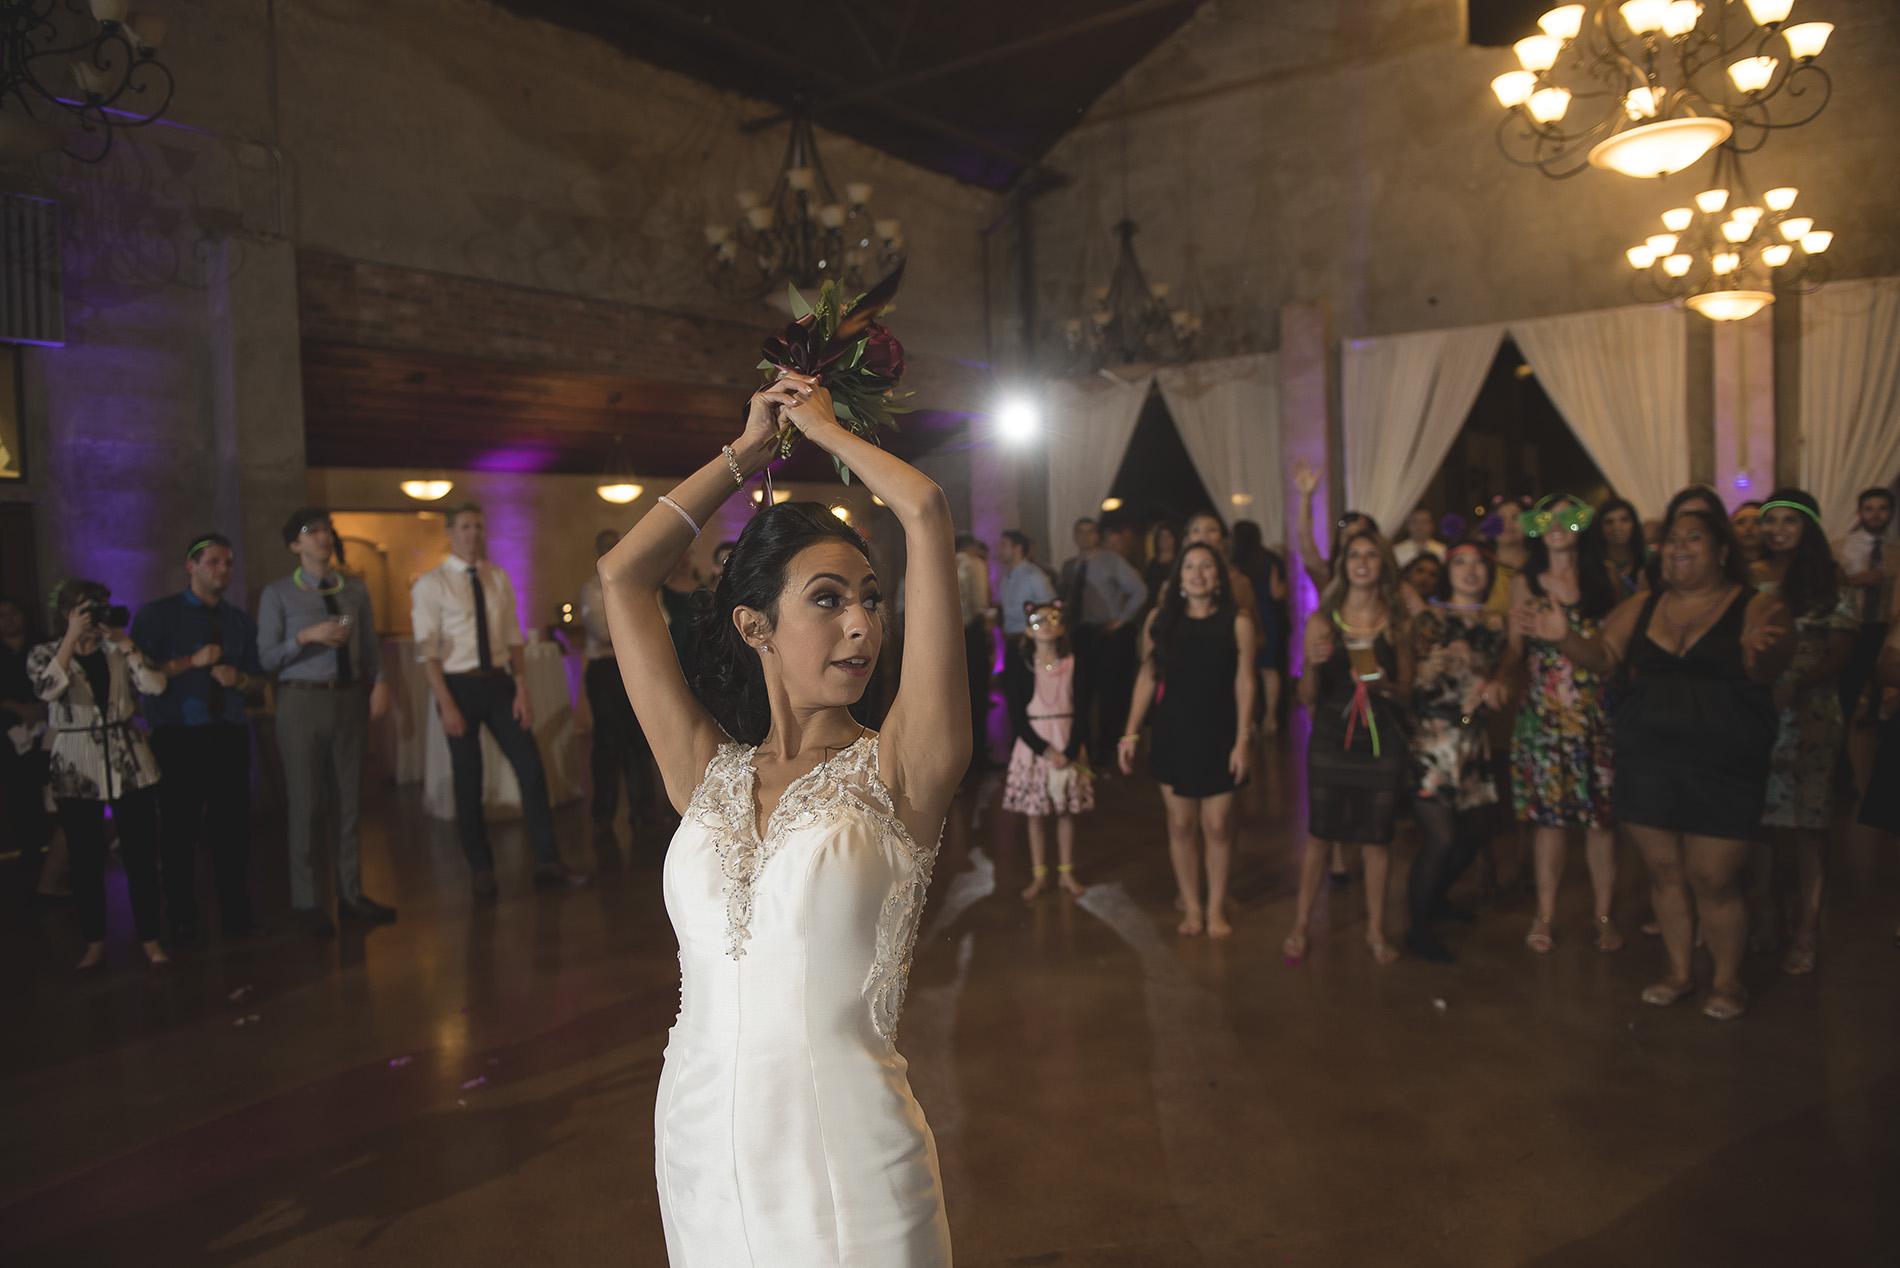 Houston-venue-Olde-Dobbin-Station-Romantic-Classic-Wedding-Photographer-114.jpg